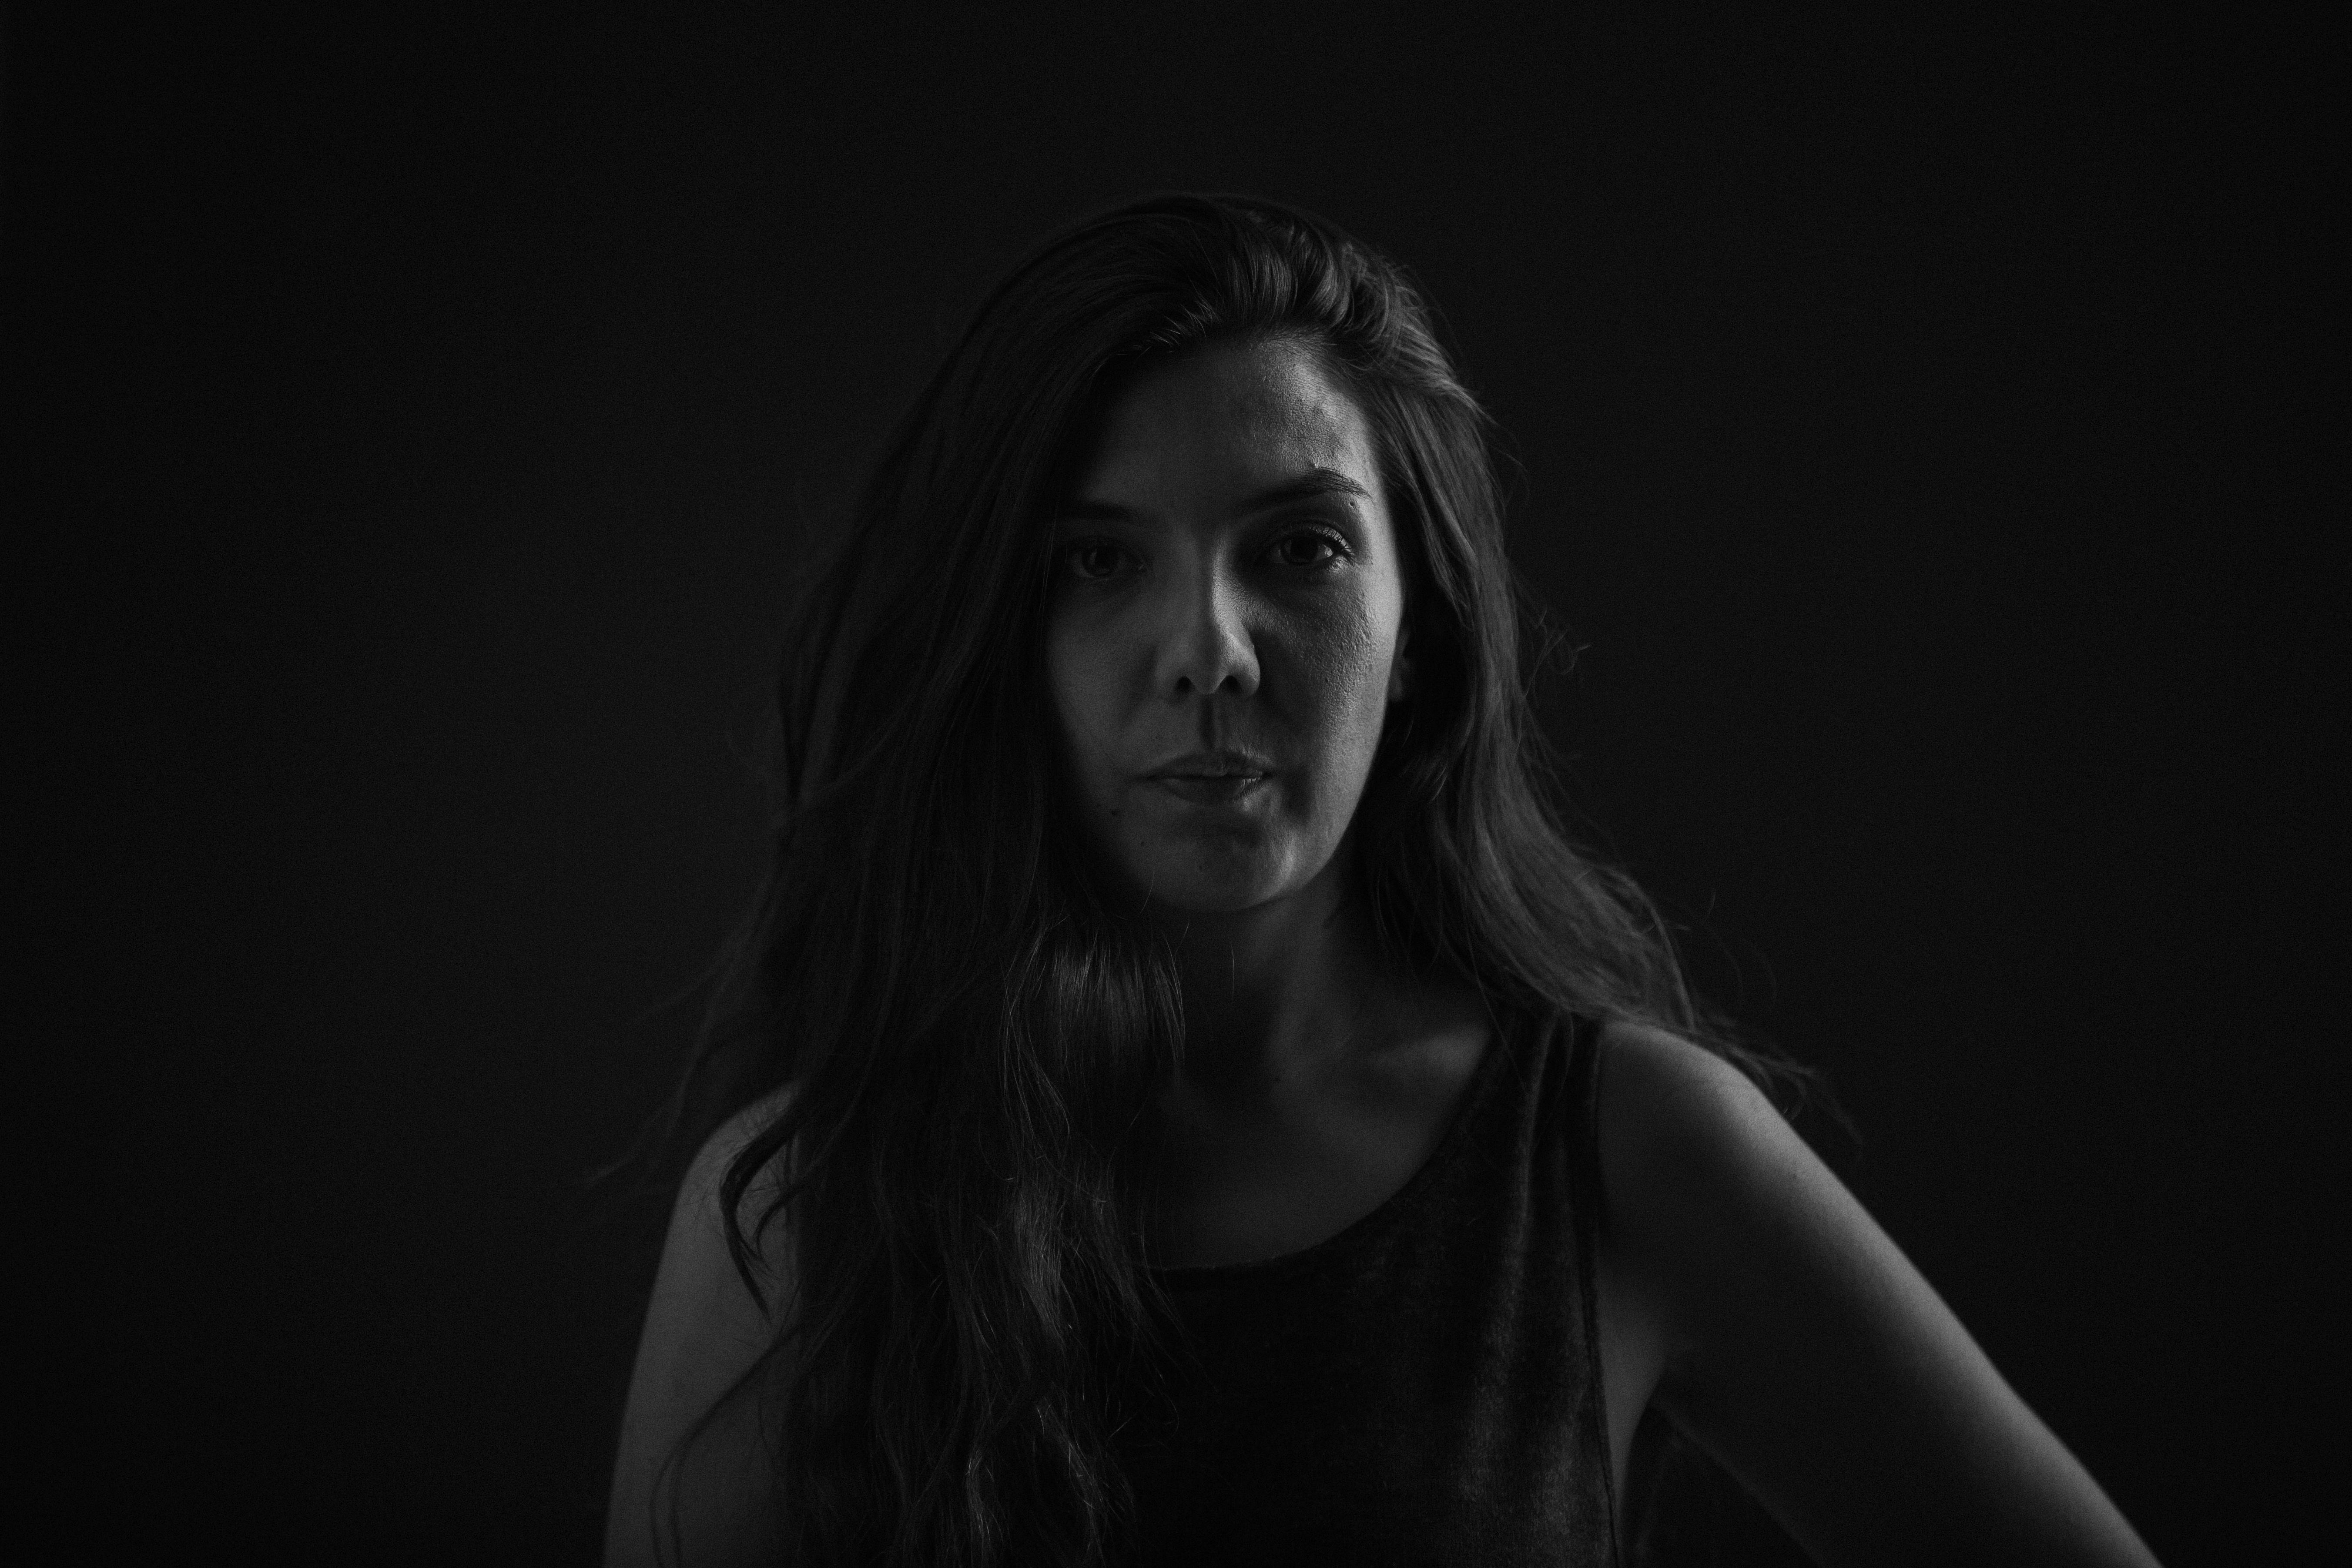 Laura Mora, directora de Matar a Jesús. Fotografía: Julián Gaviria